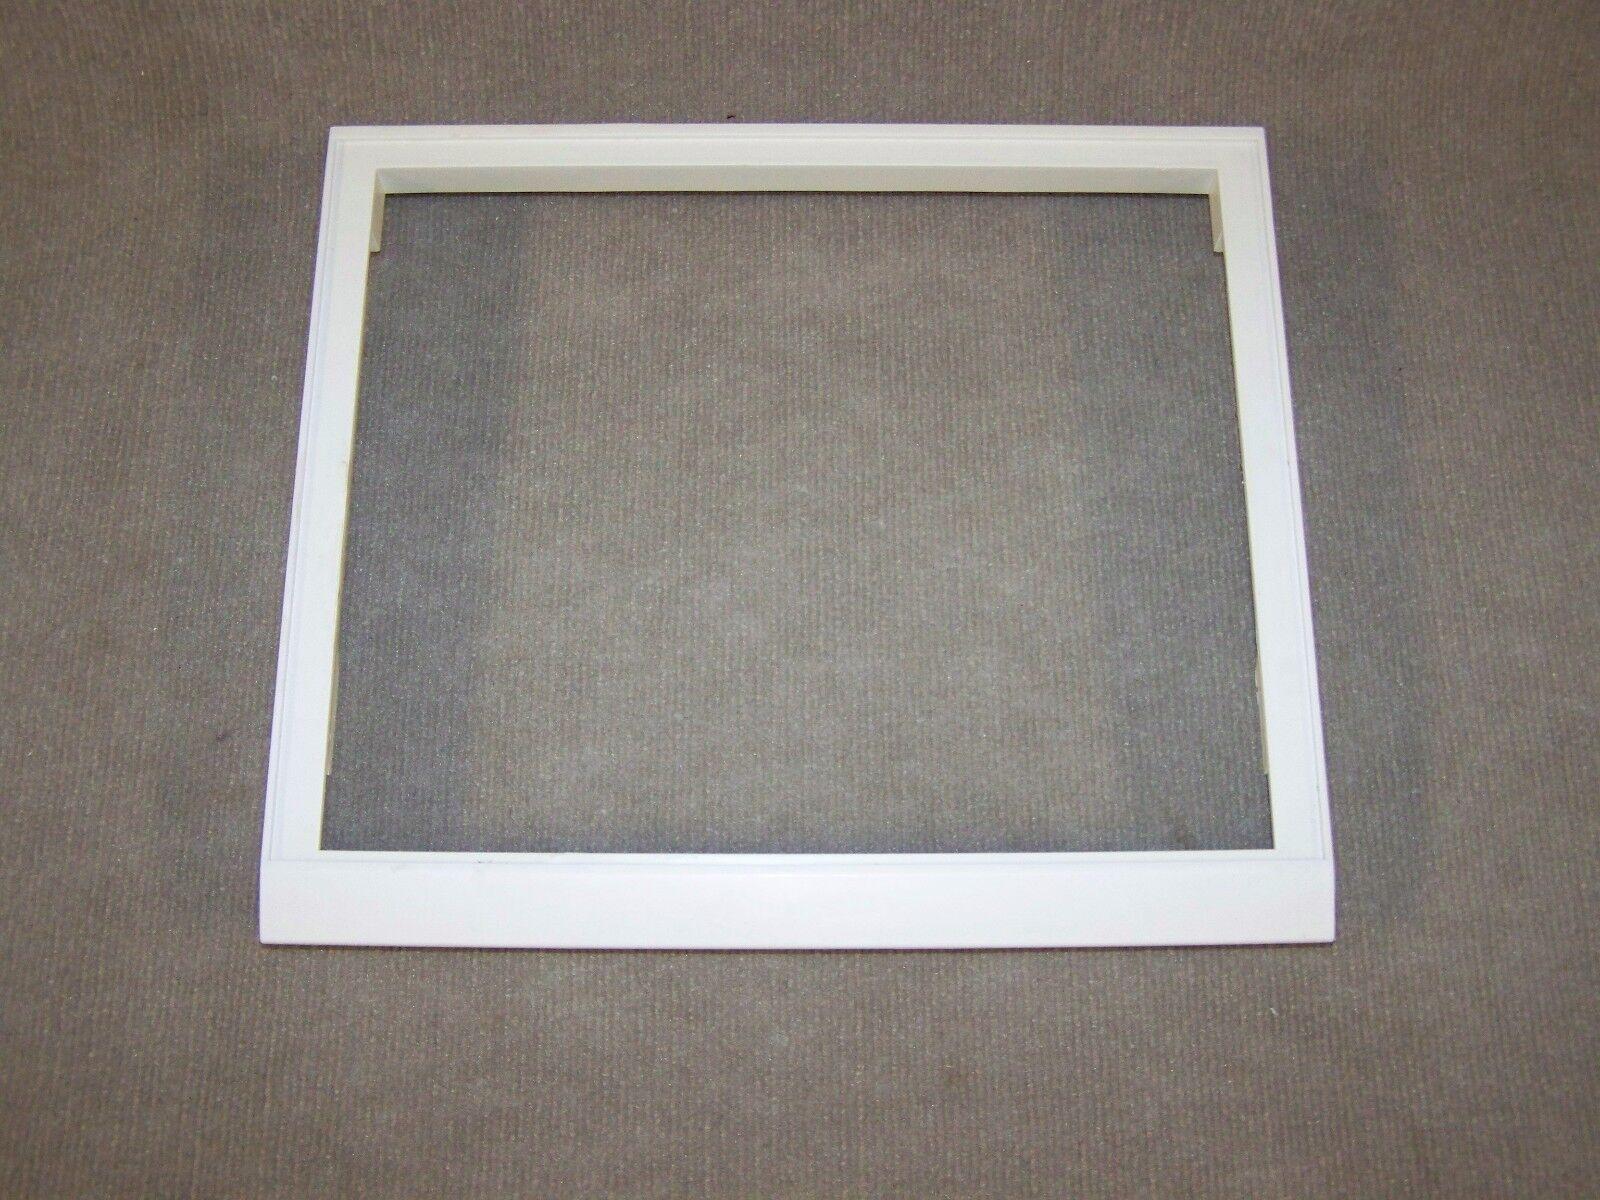 kenmore 51133. w10508993 whirlpool kenmore refrigerator crisper frame kenmore 51133